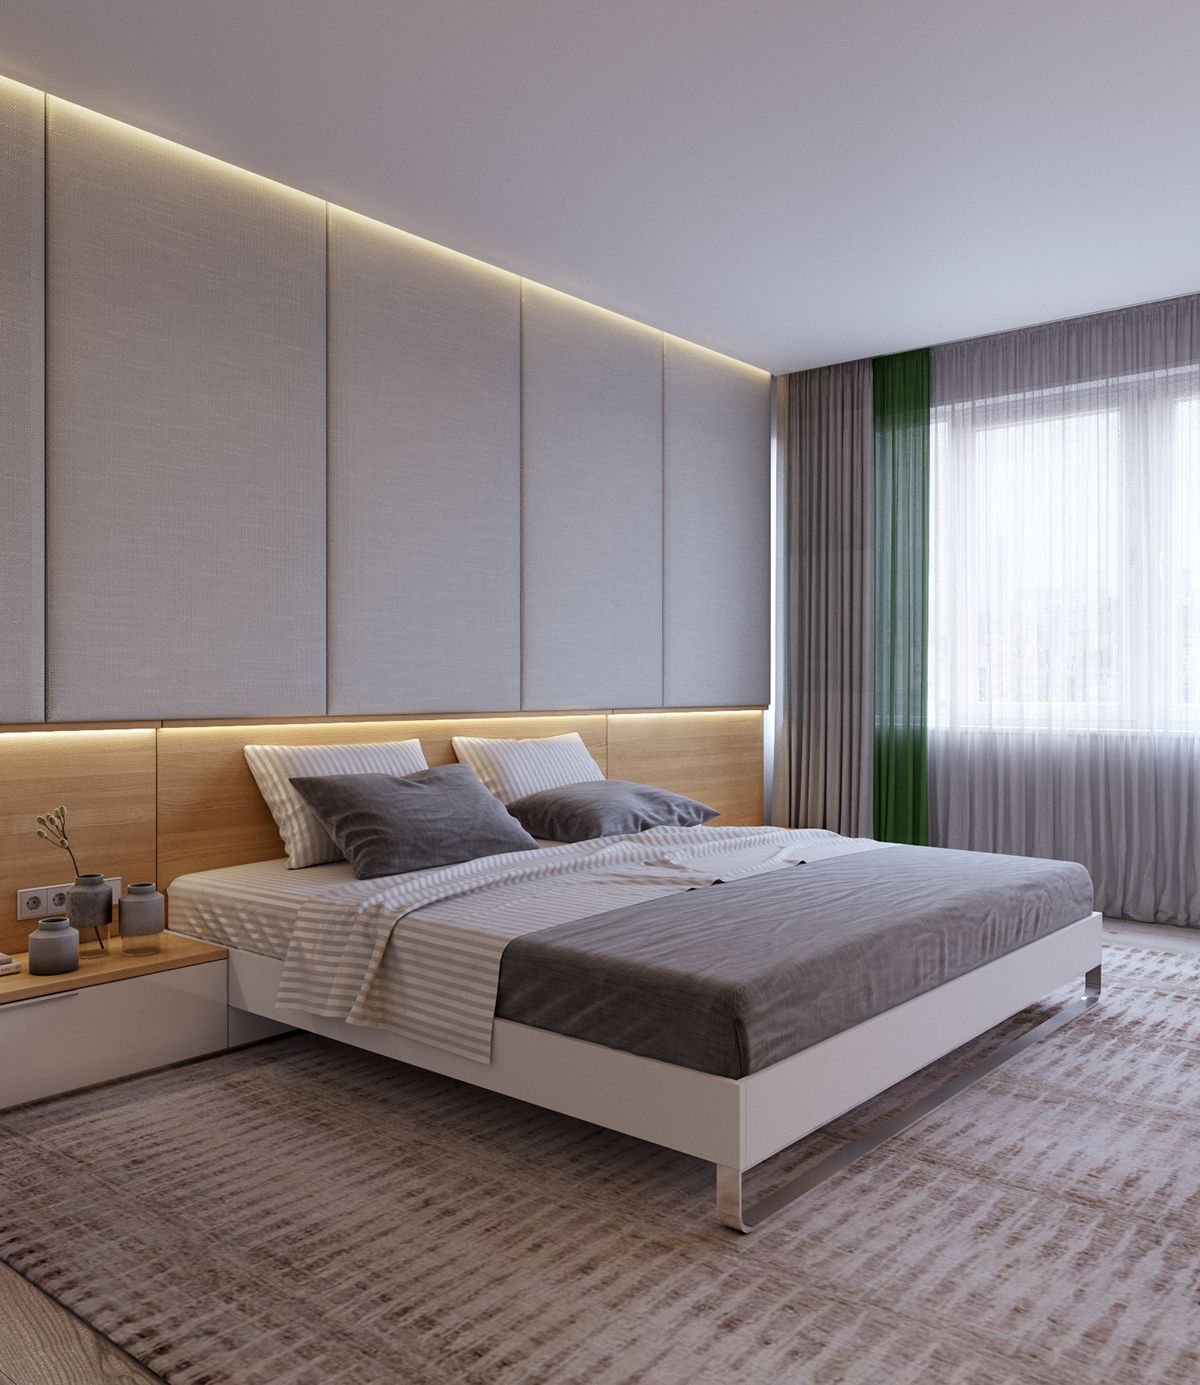 Family Apartment: Family Apartment In Samara On Behance